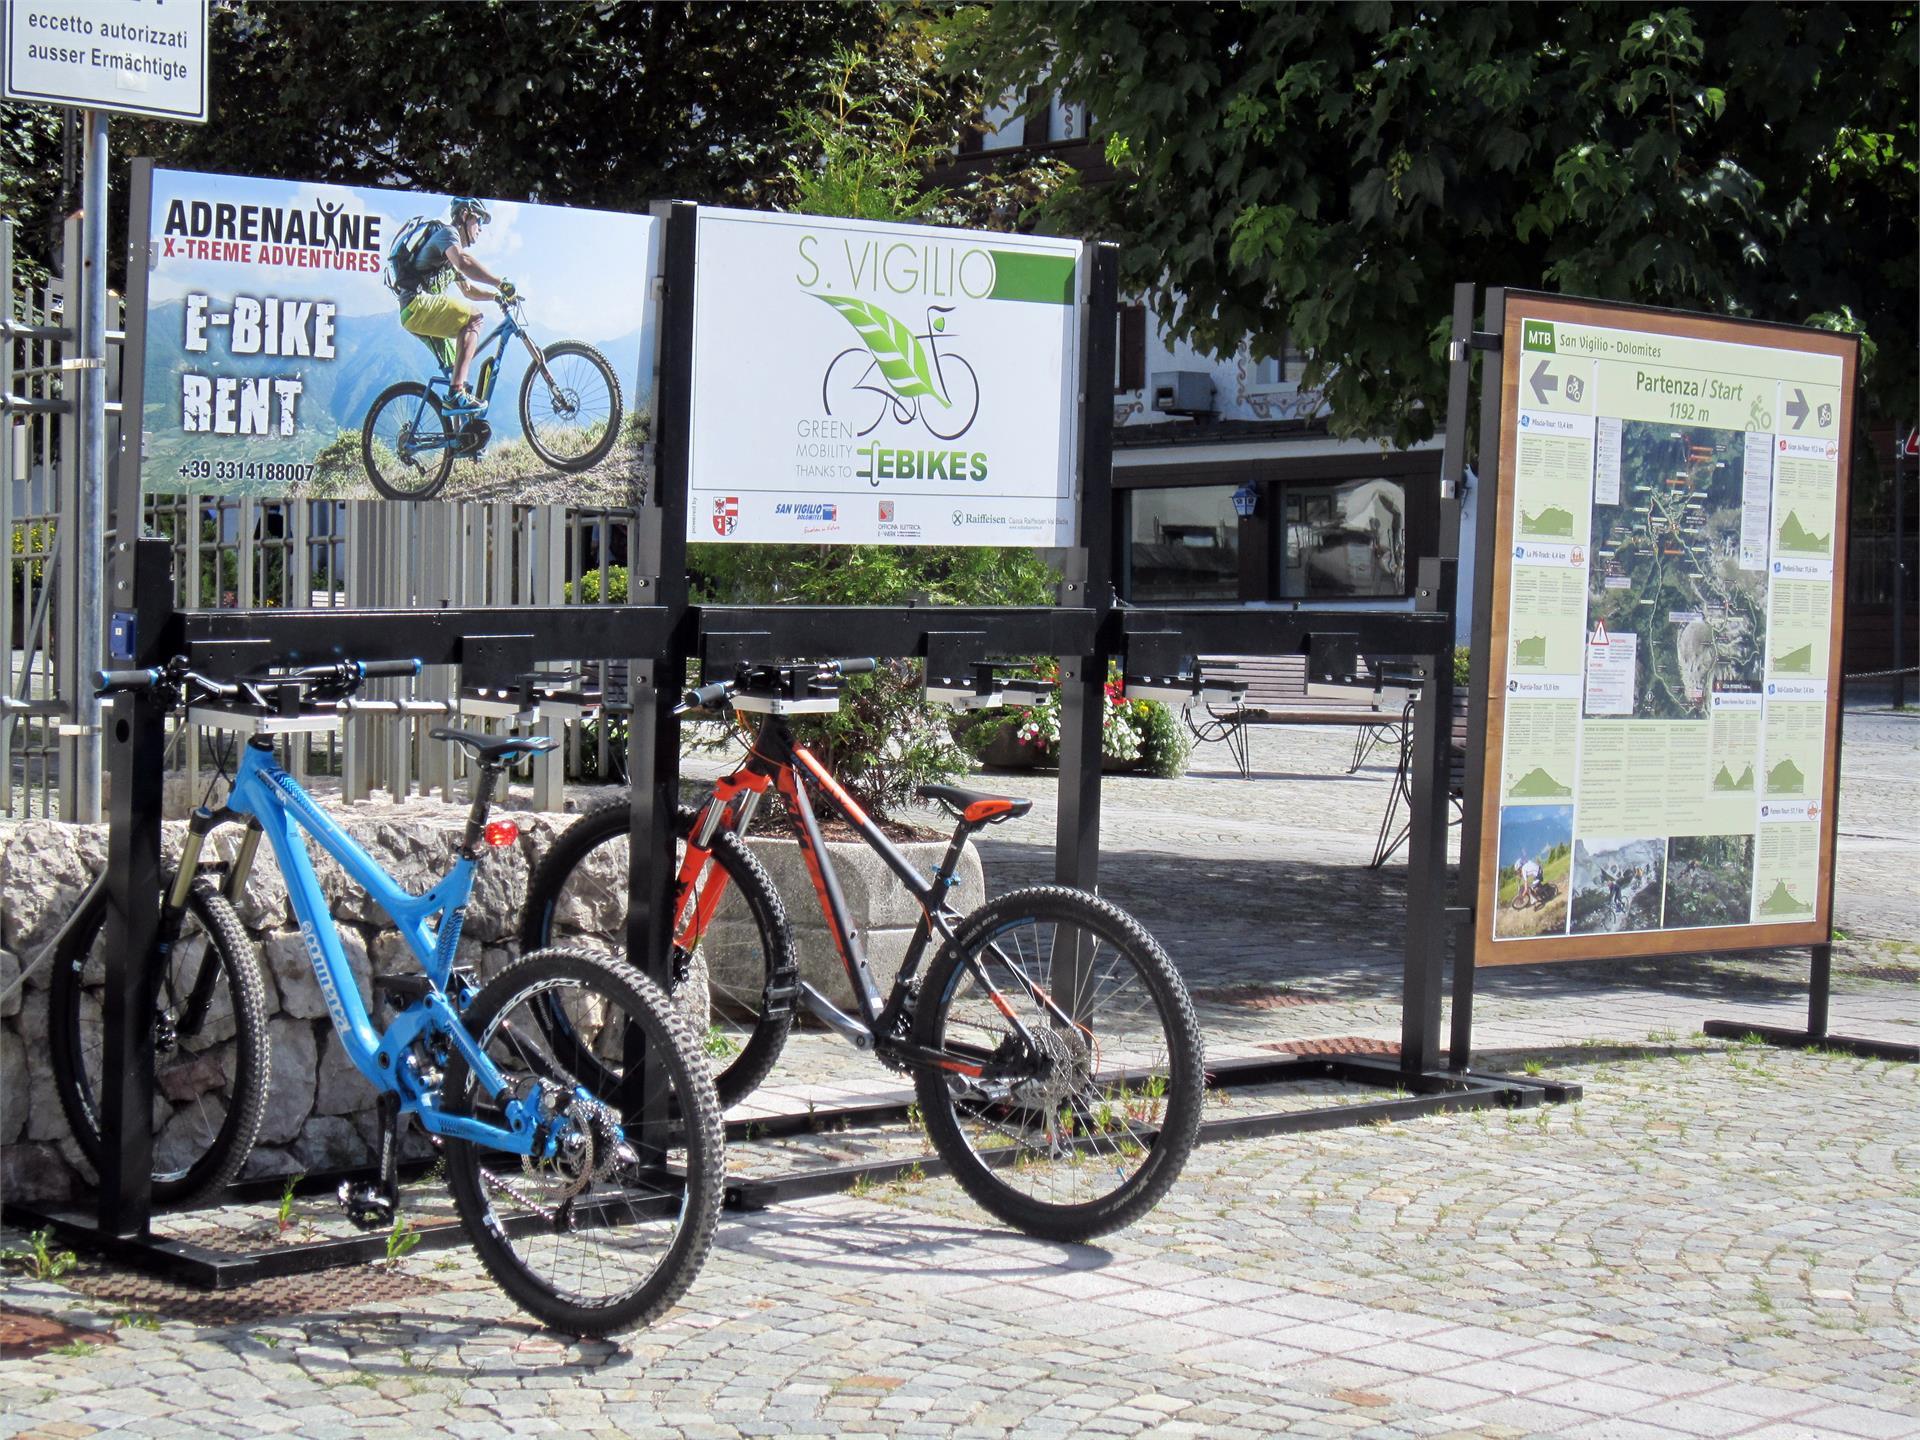 E-bike carge Cetre San Vigilio